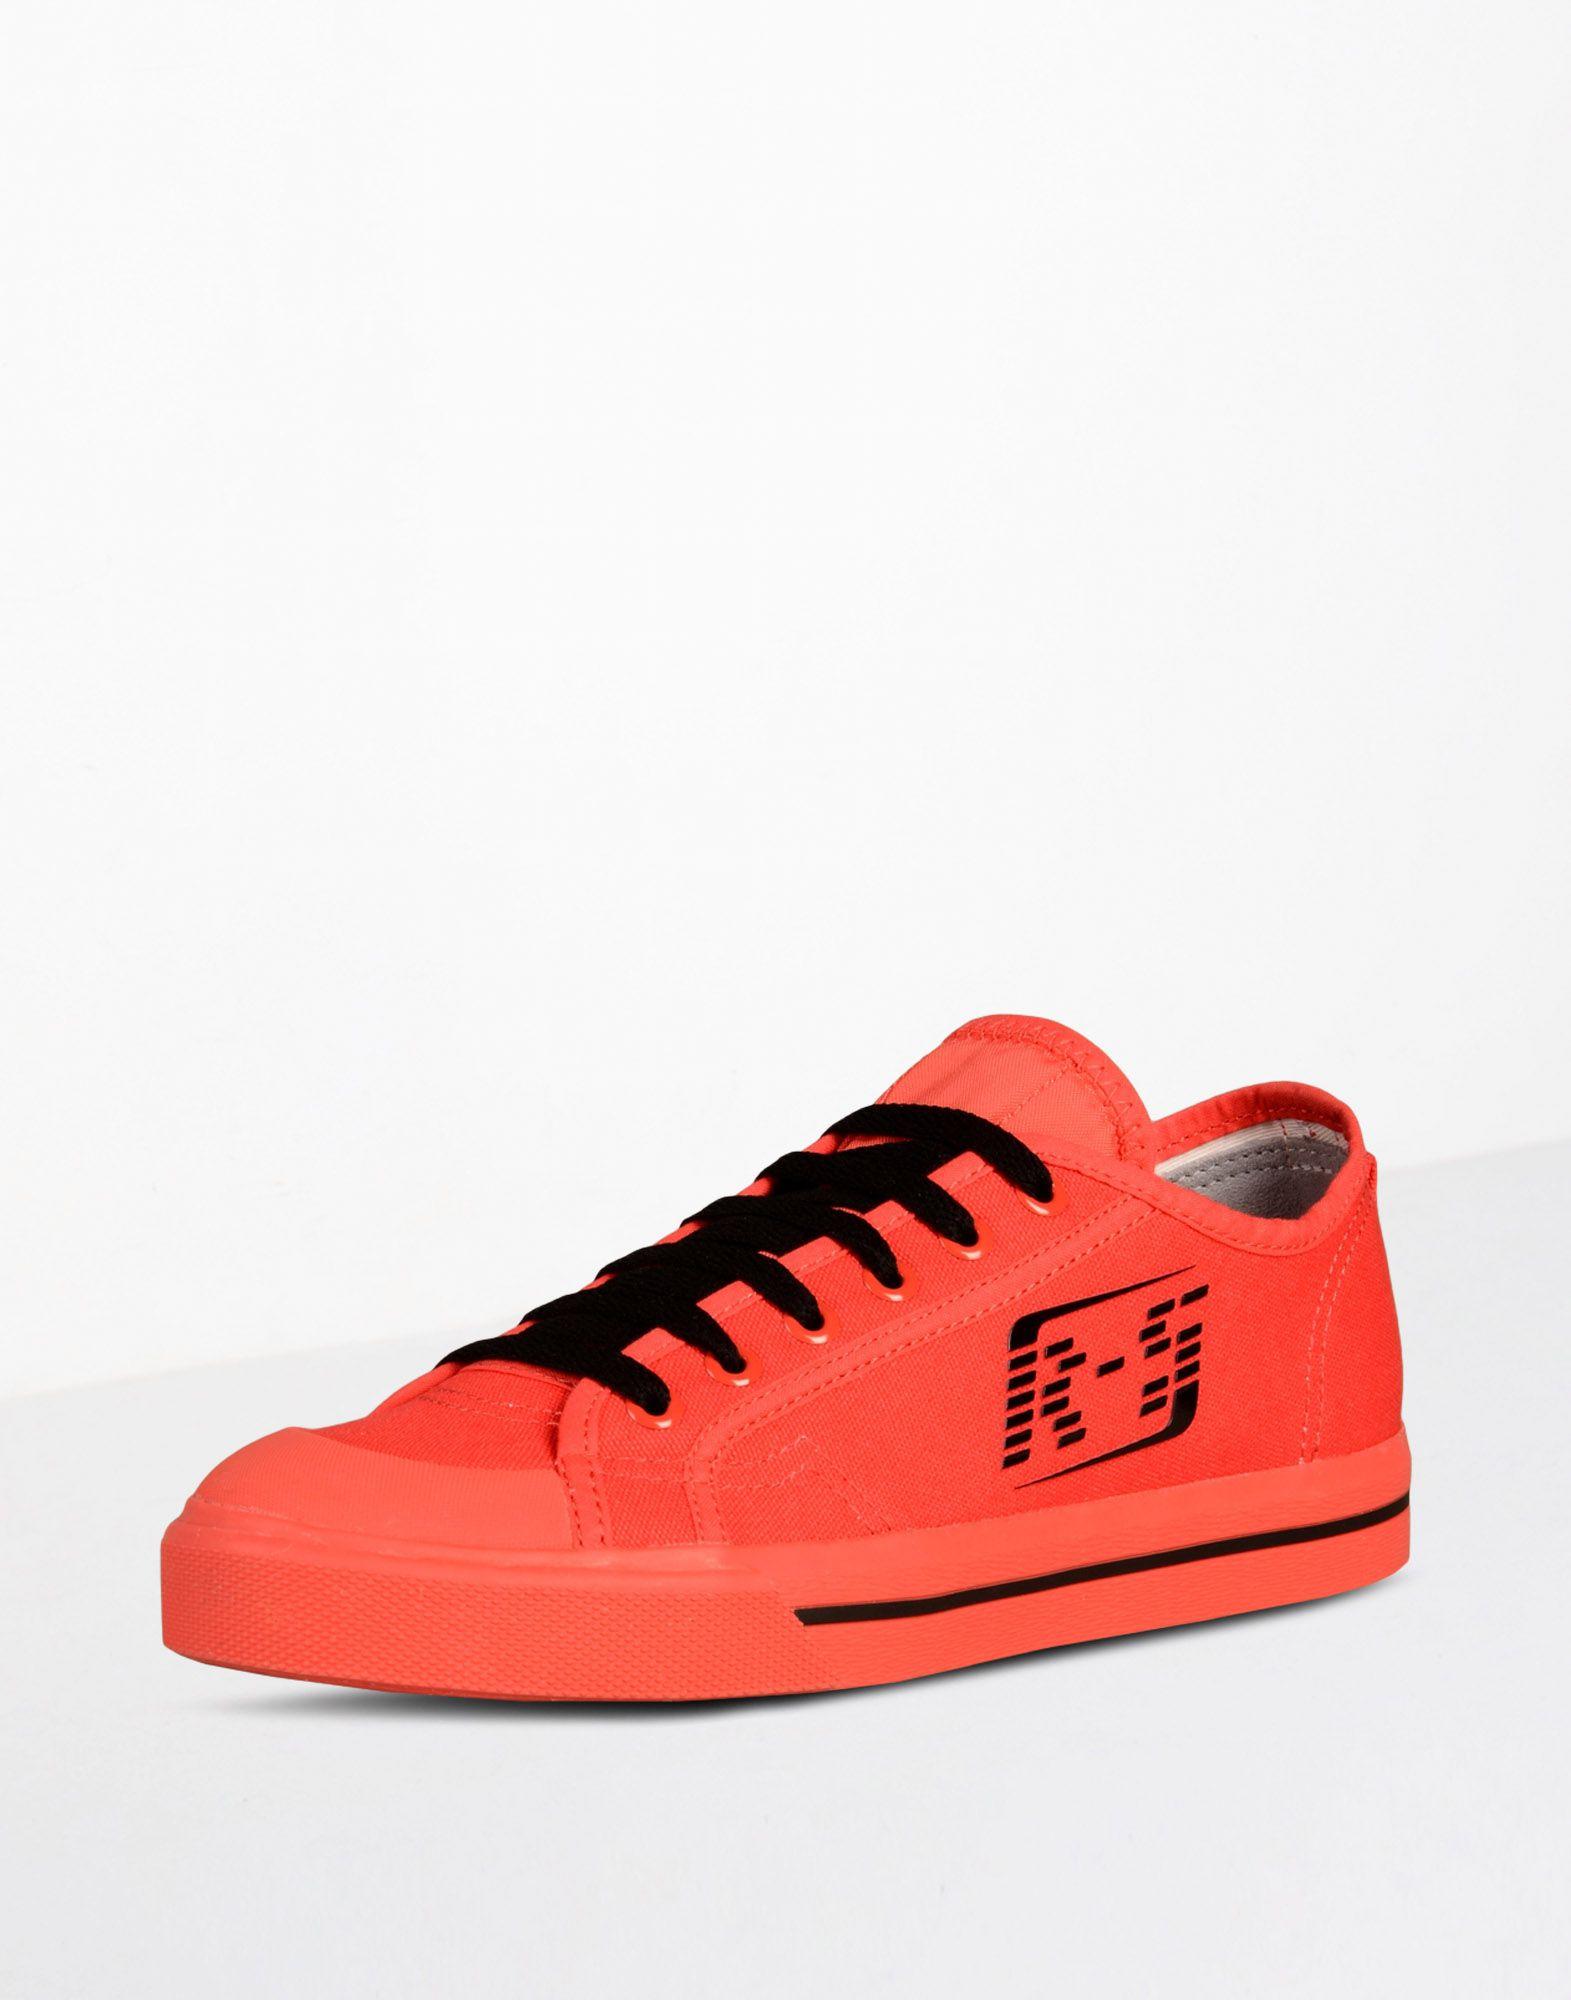 Raf Simons Spirit Low adidas by Raf Simons Eda4cVRq